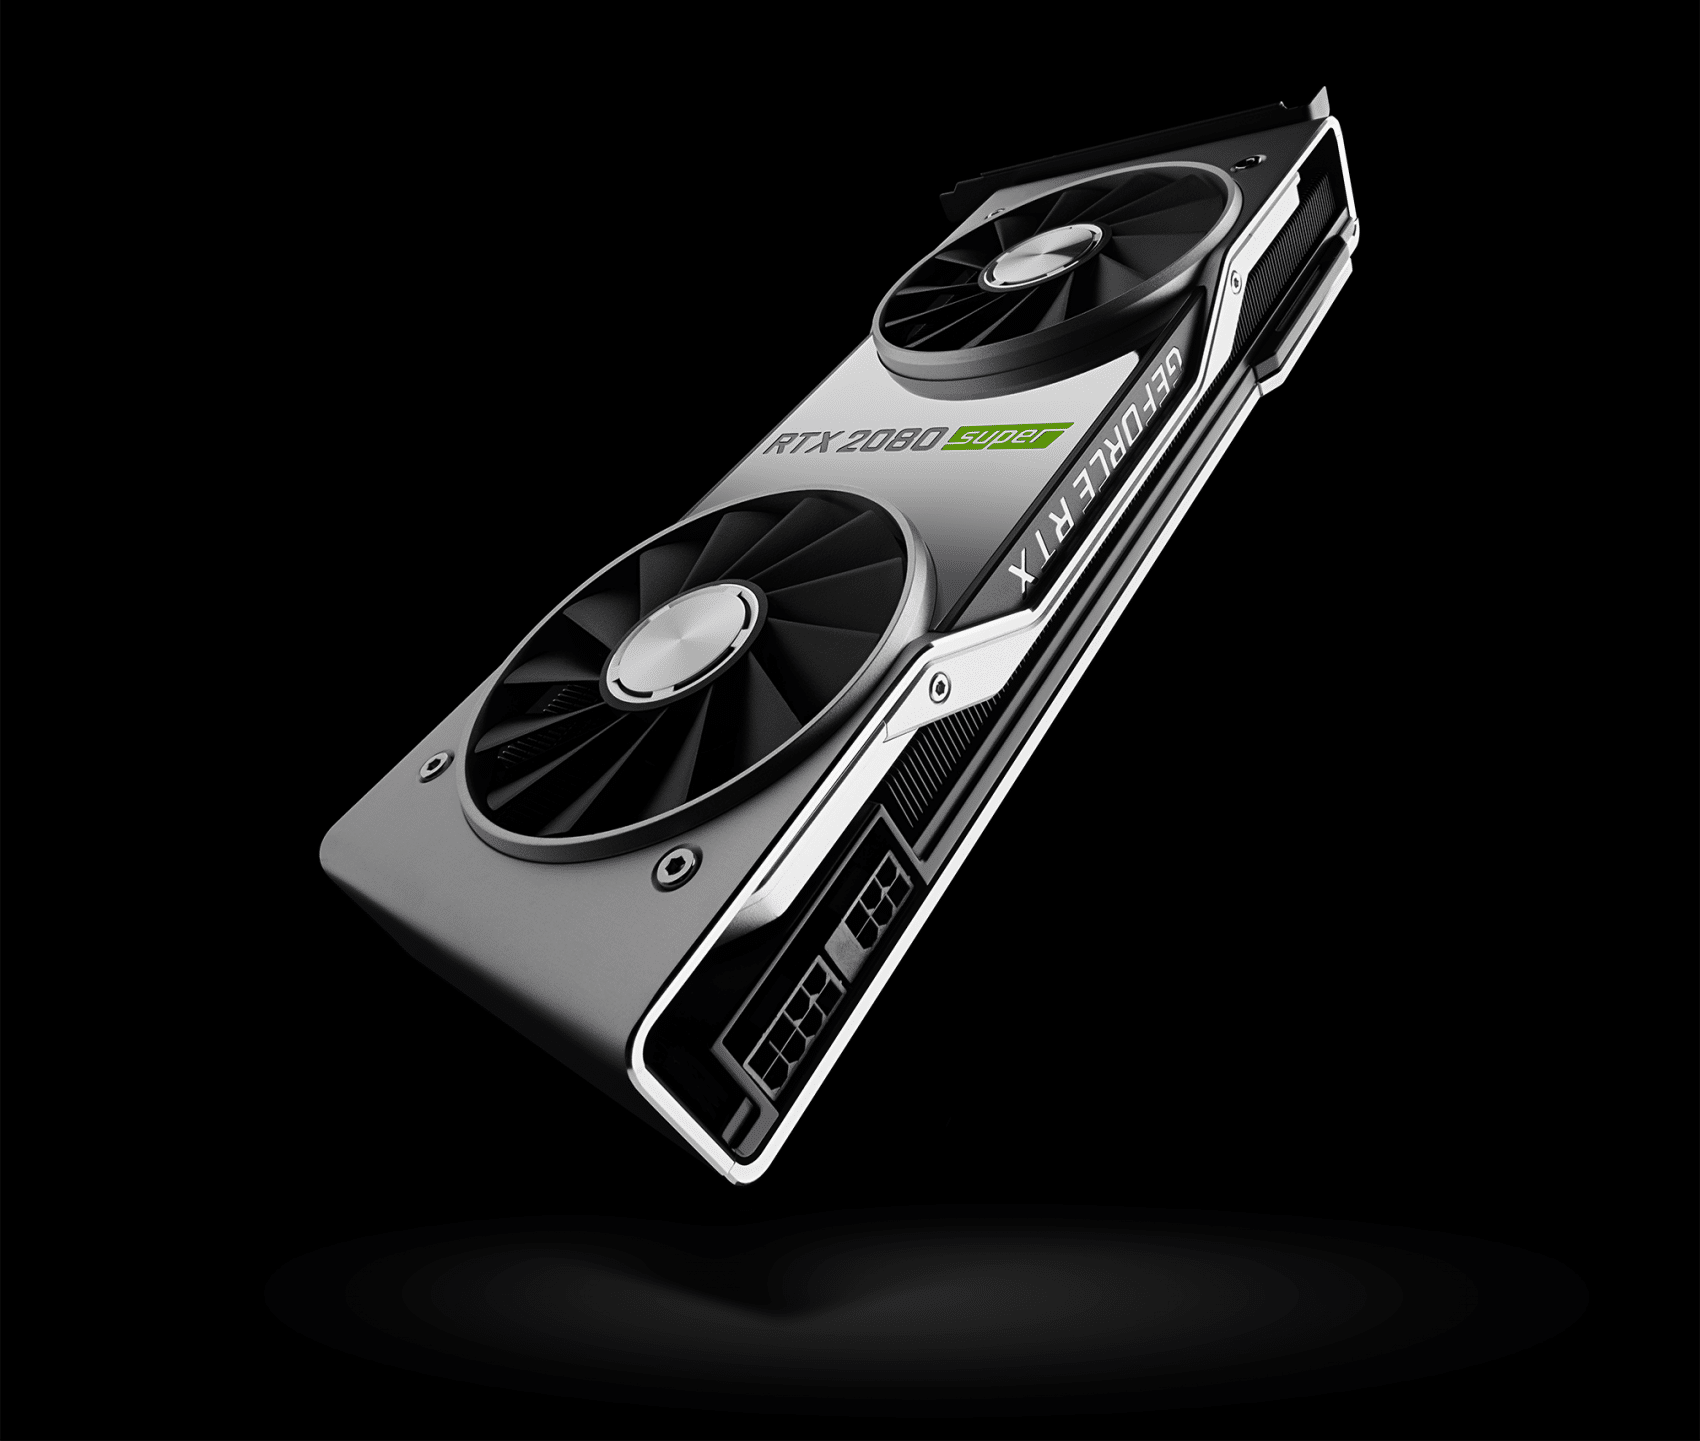 Carte graphique Nvidia GeForce RTX 2080 Super